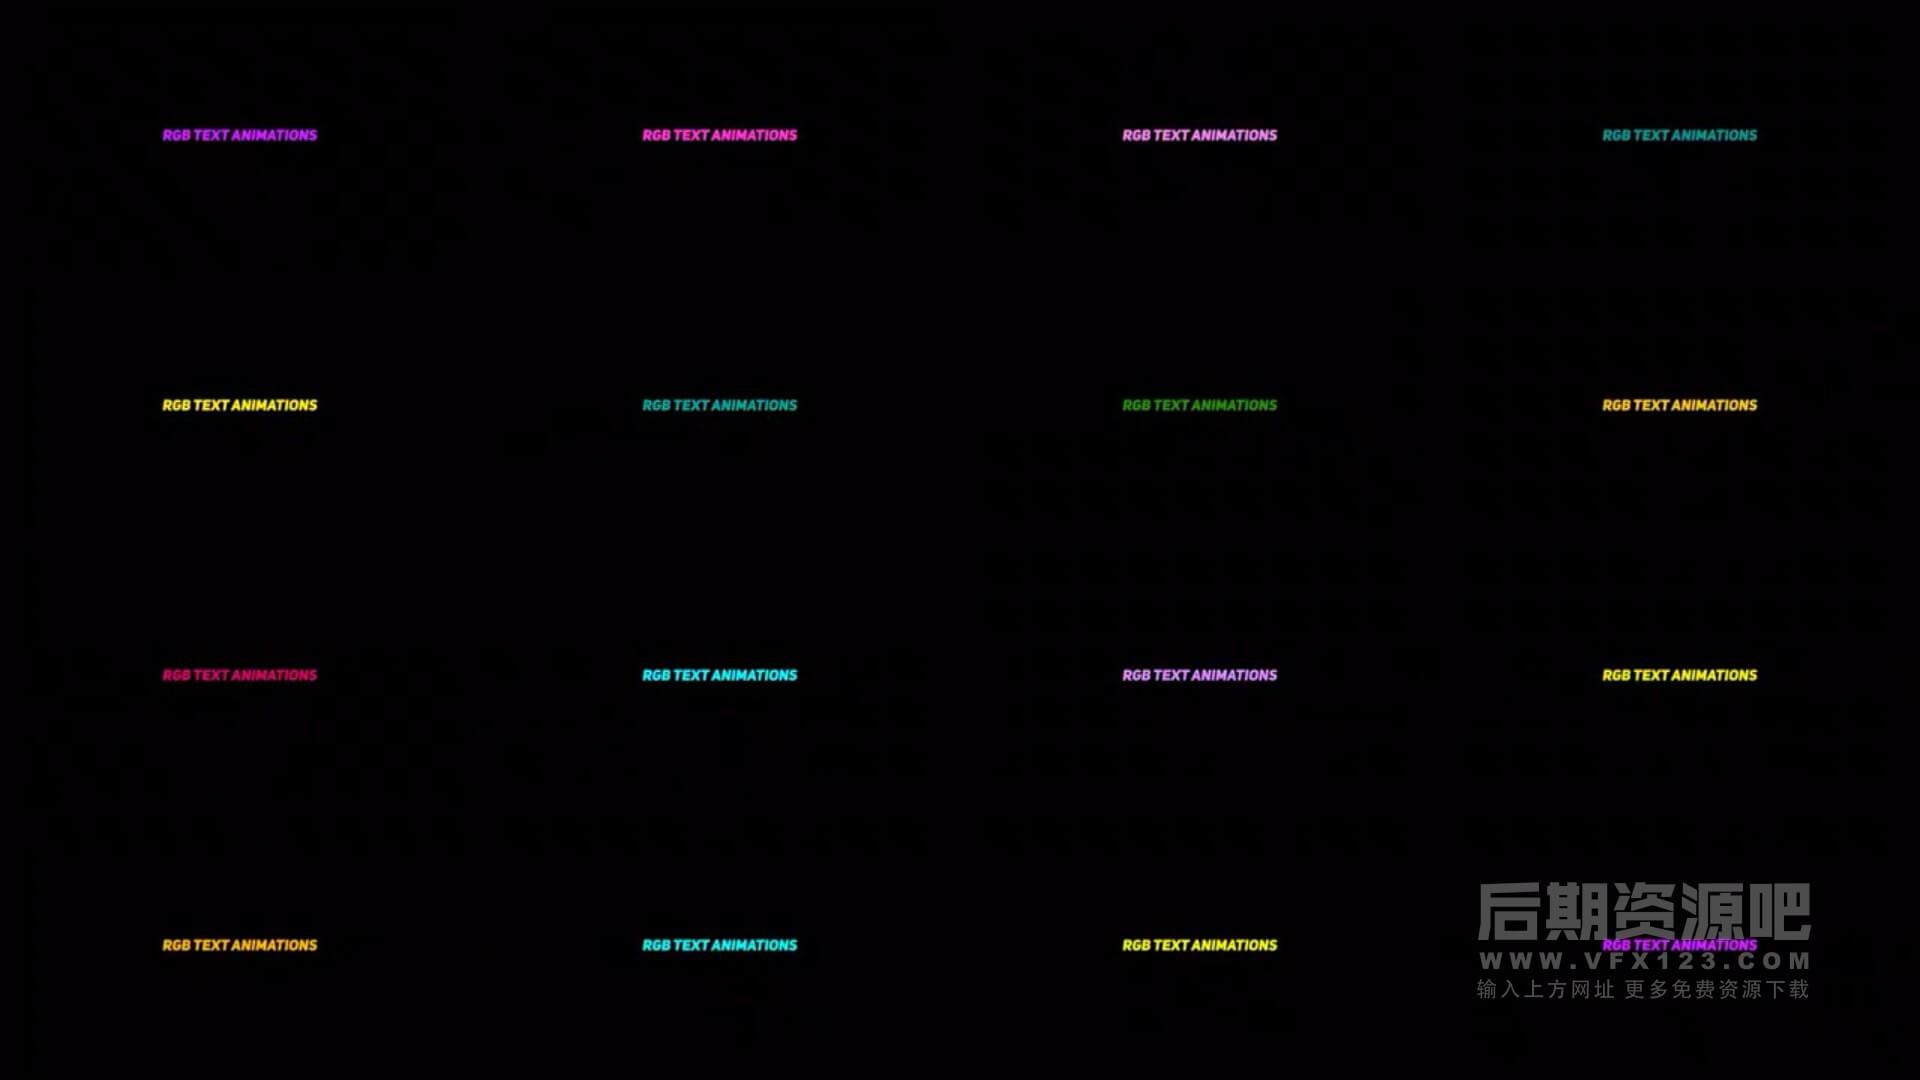 FCPX标题插件 16组RGB彩色闪烁跳动活泼文字标题预设动画 RGB Text Animations